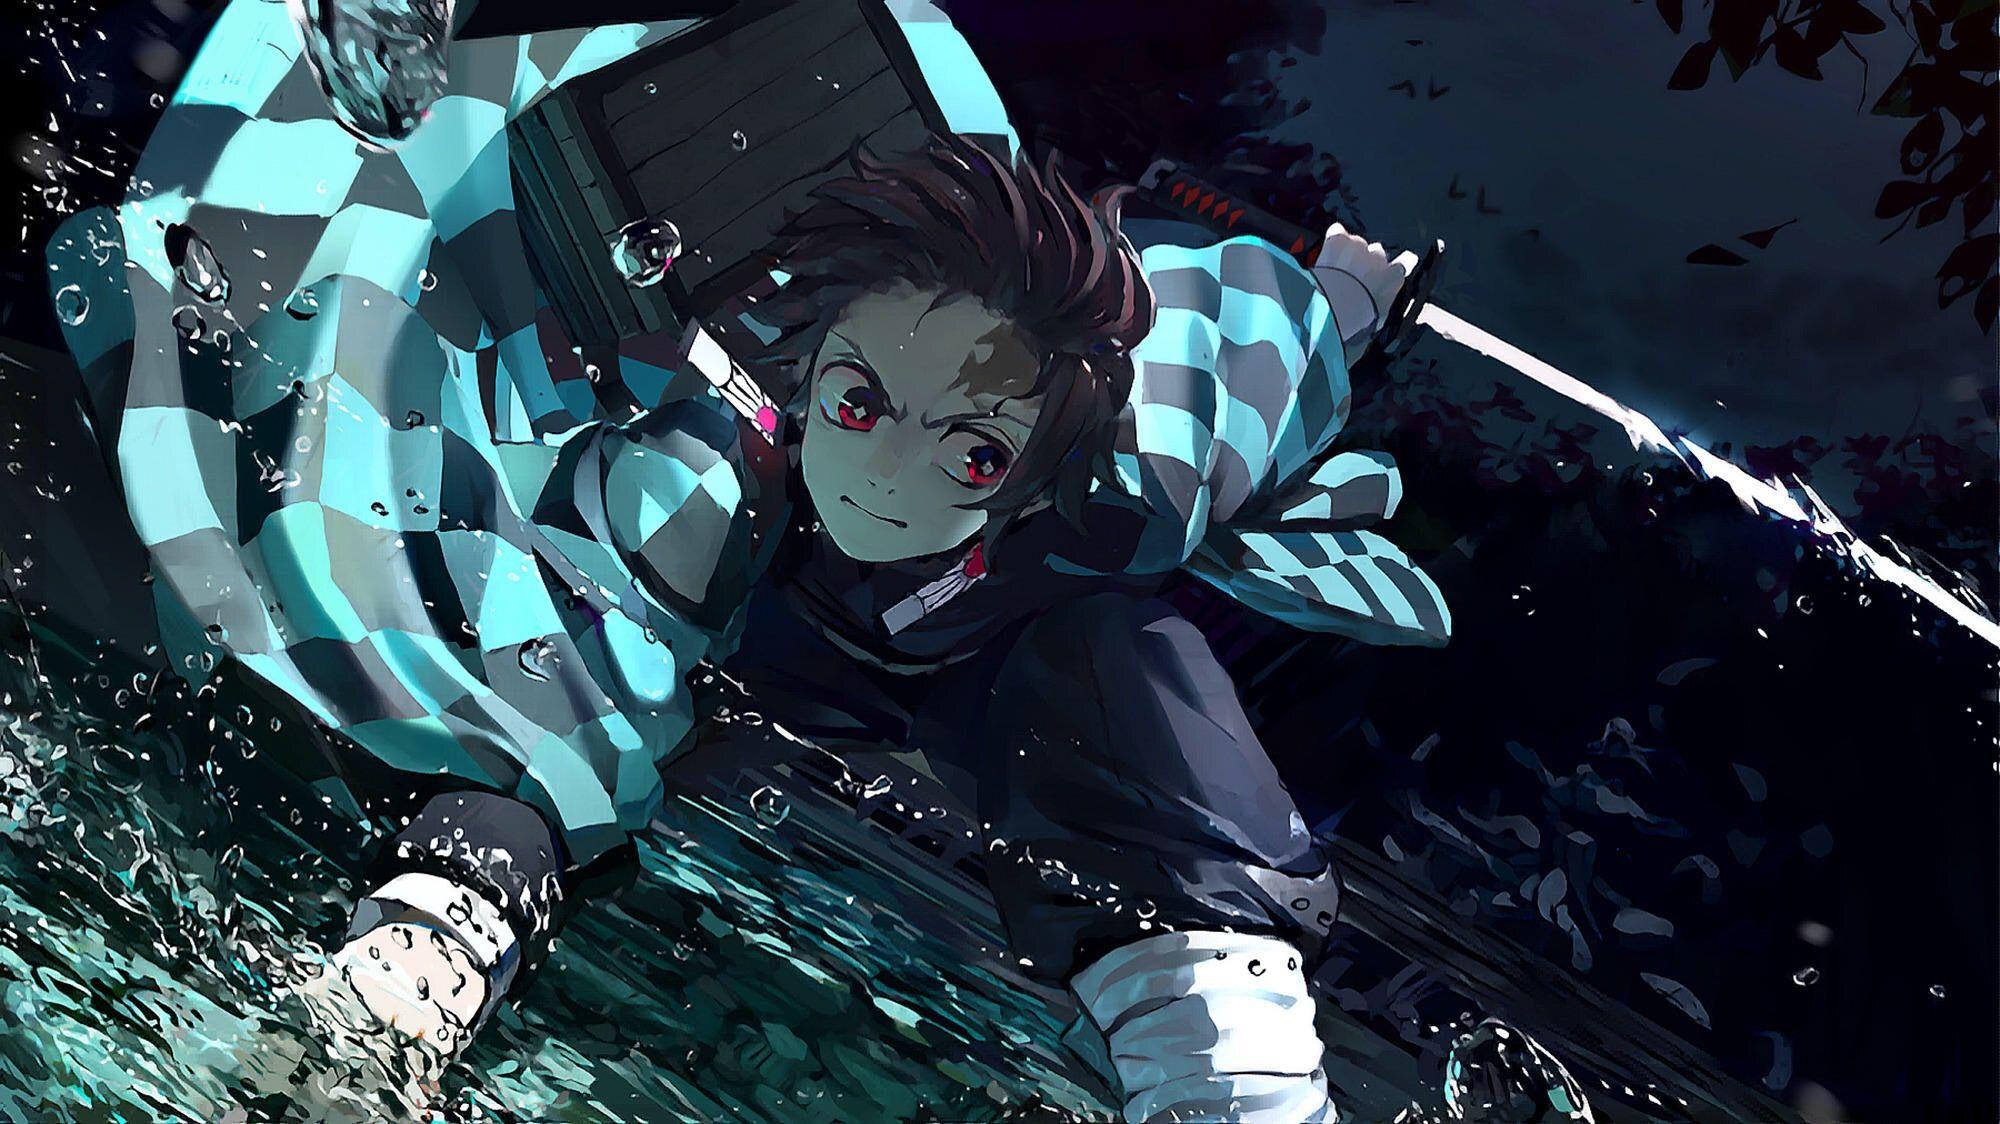 Save Follow Yui Hd Anime Wallpapers Cool Anime Wallpapers Anime Wallpaper Download